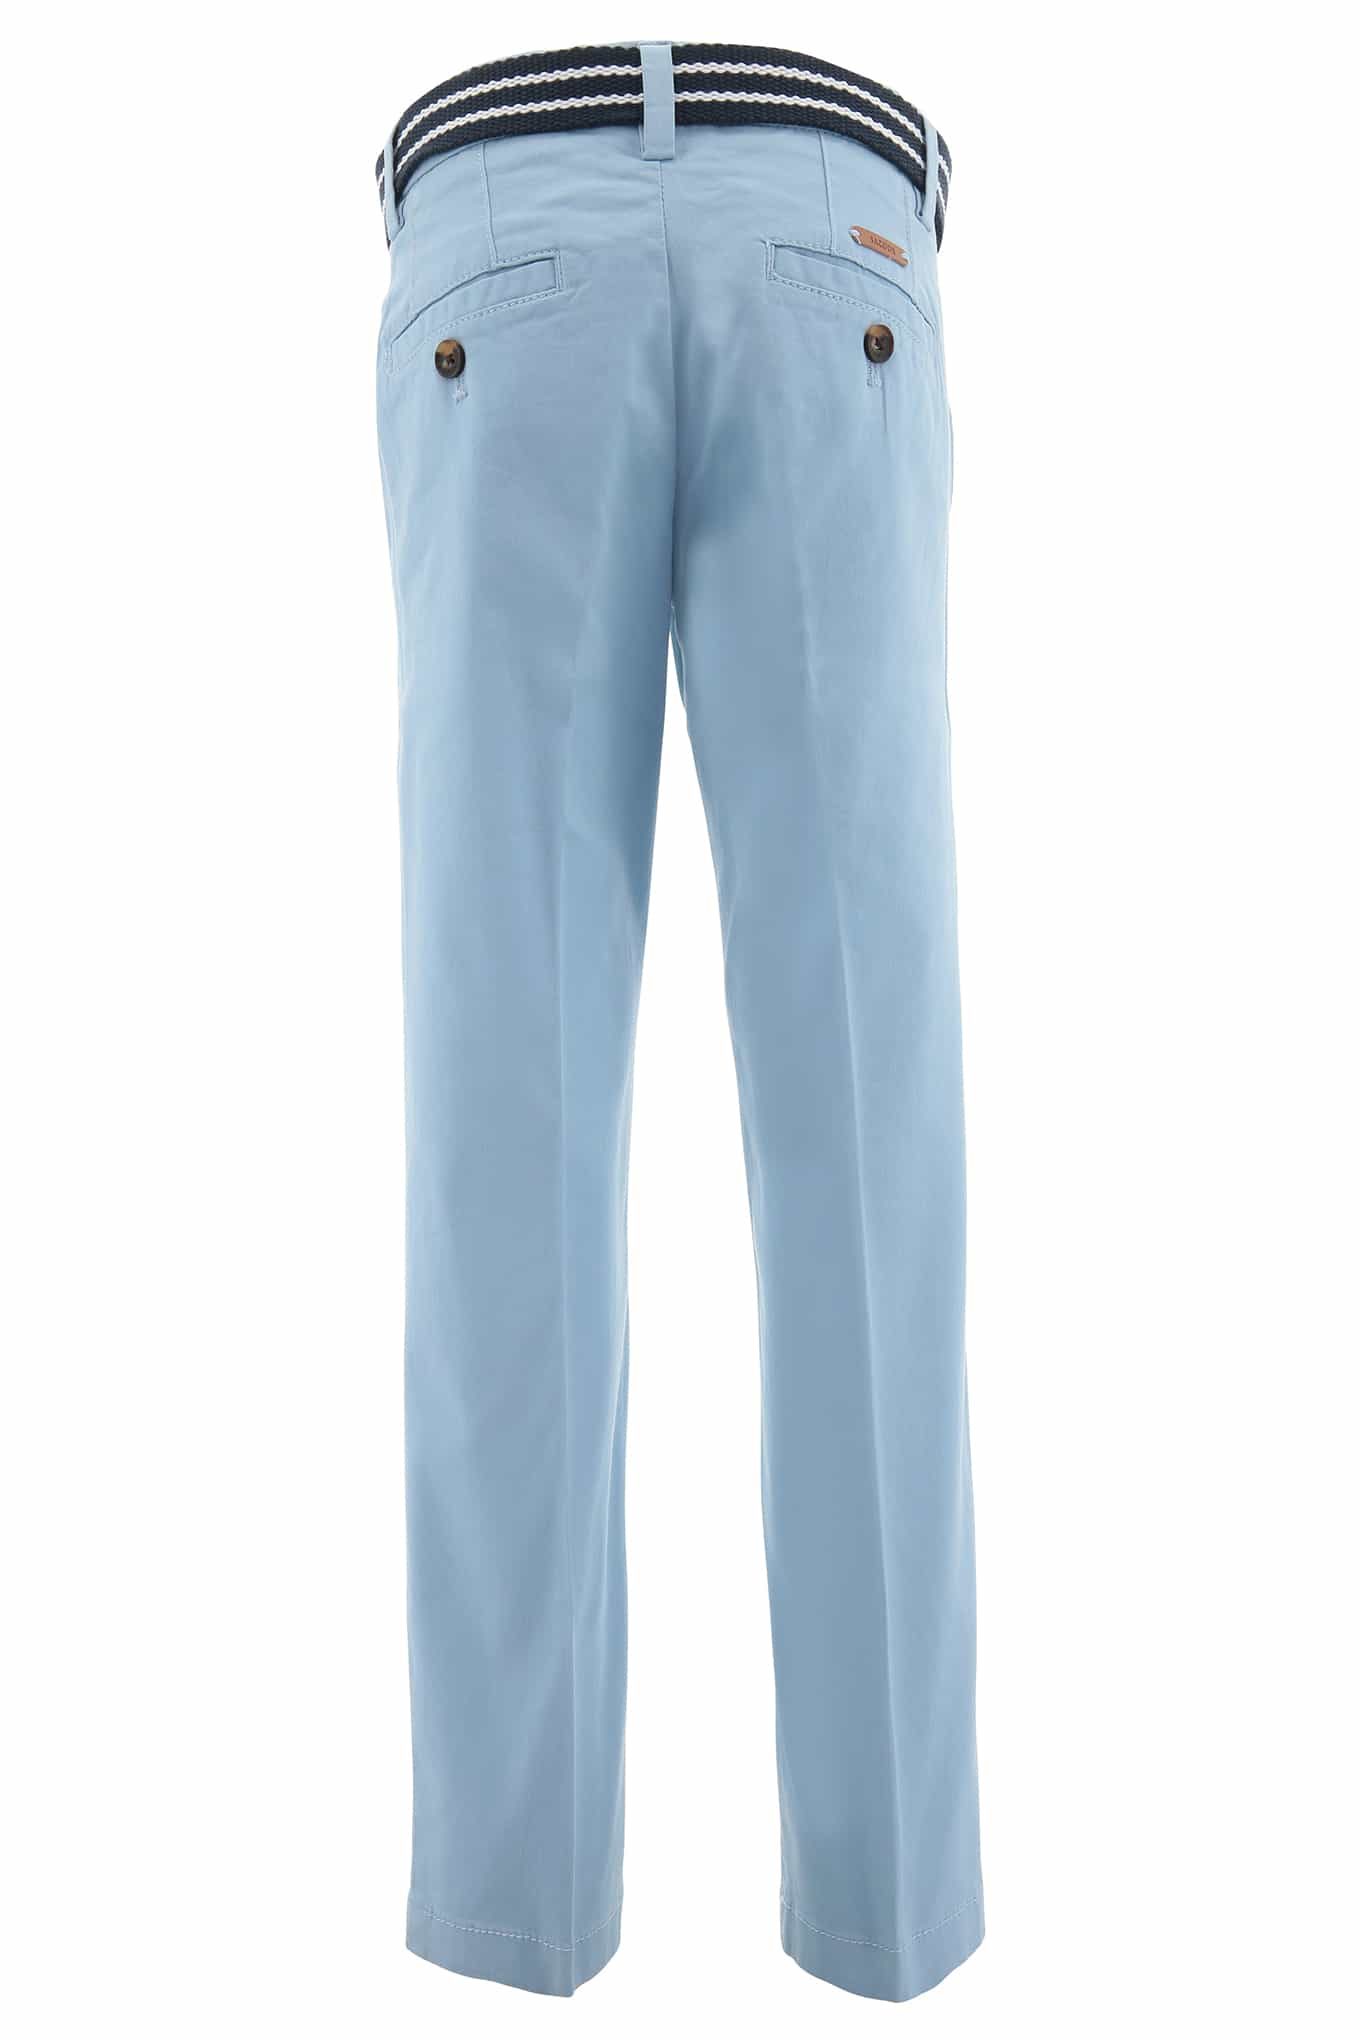 Chino Trousers Light Blue Sport Boy